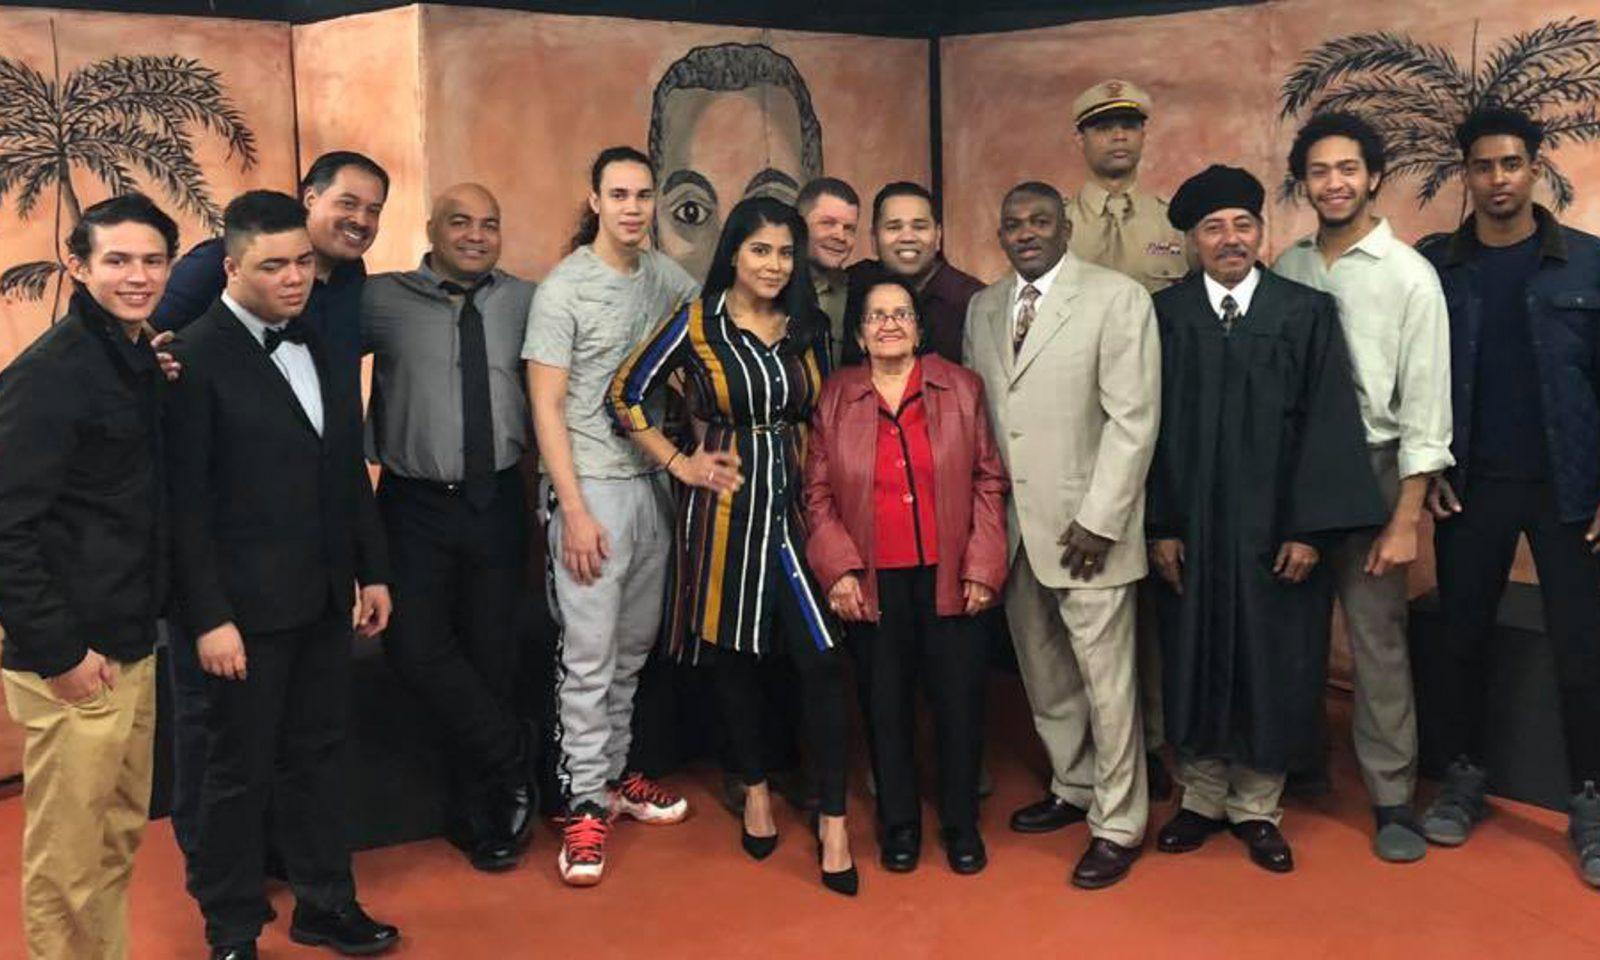 Teatro ECAS, 2018 NALAC Fund for the Arts Grantee